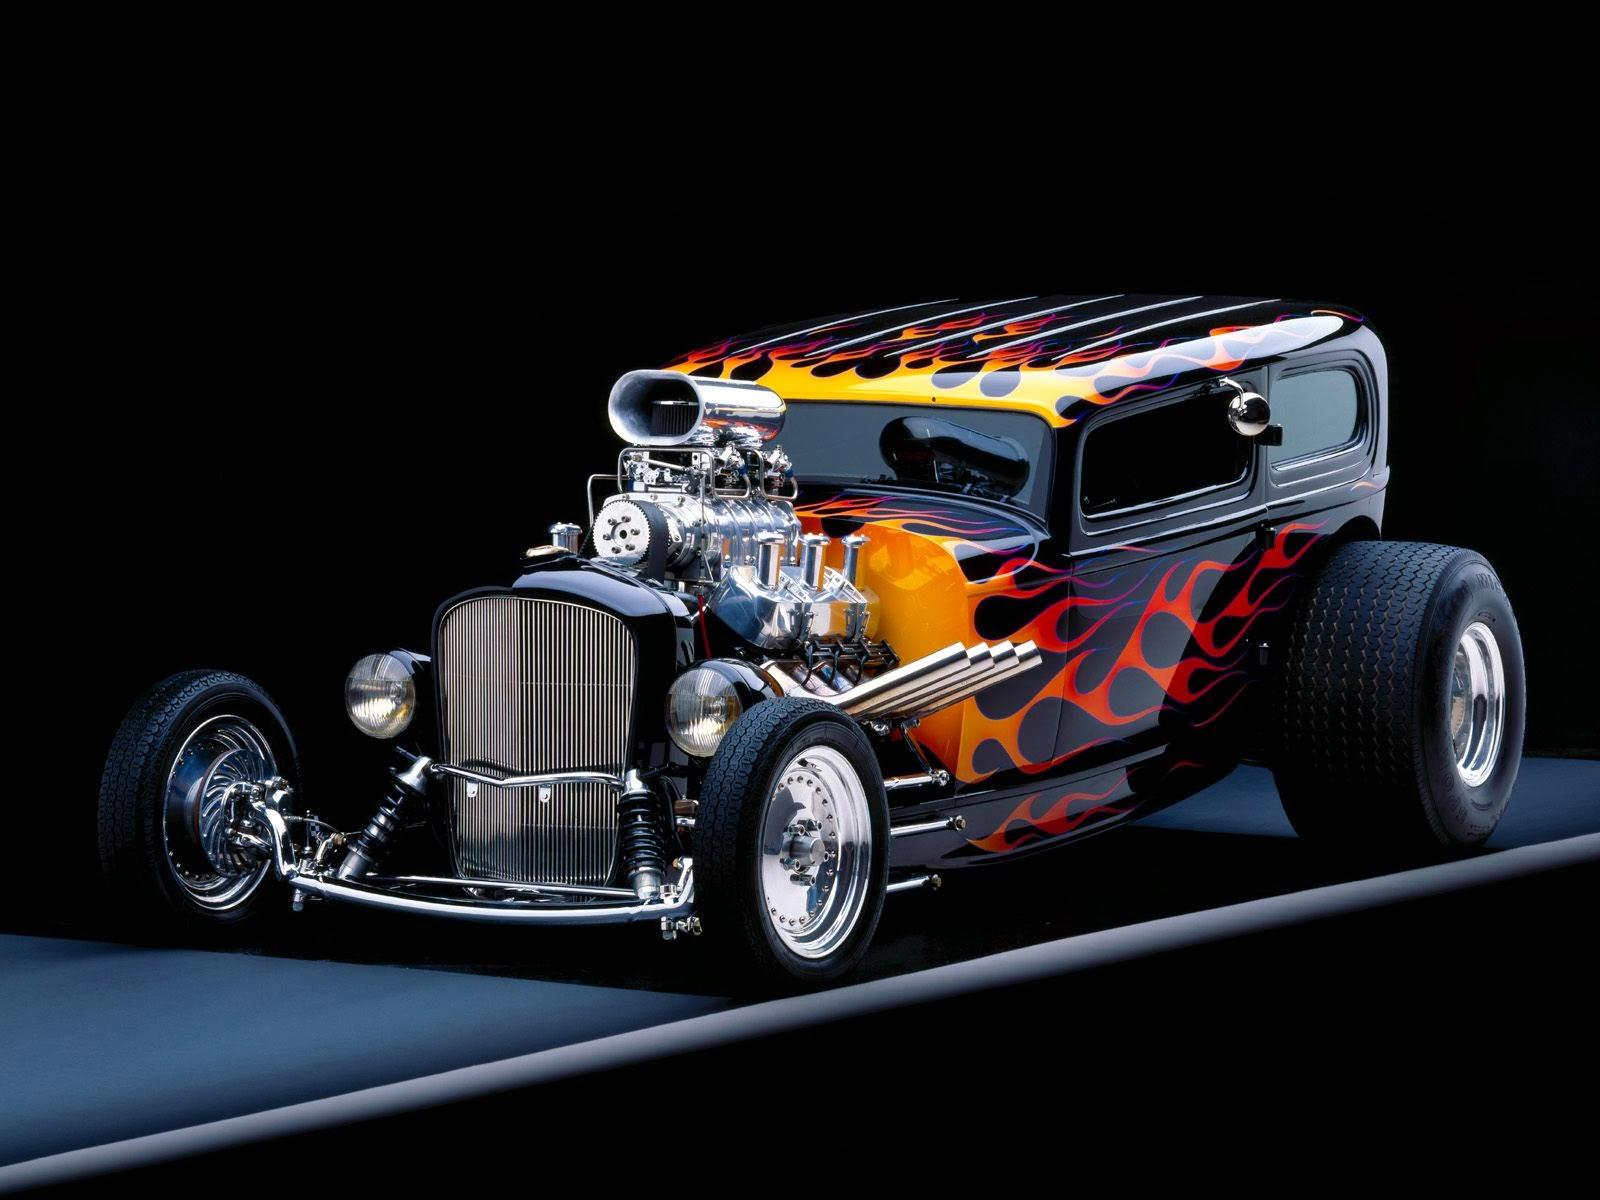 Robot Car Wallpapers Cars Wallpaper